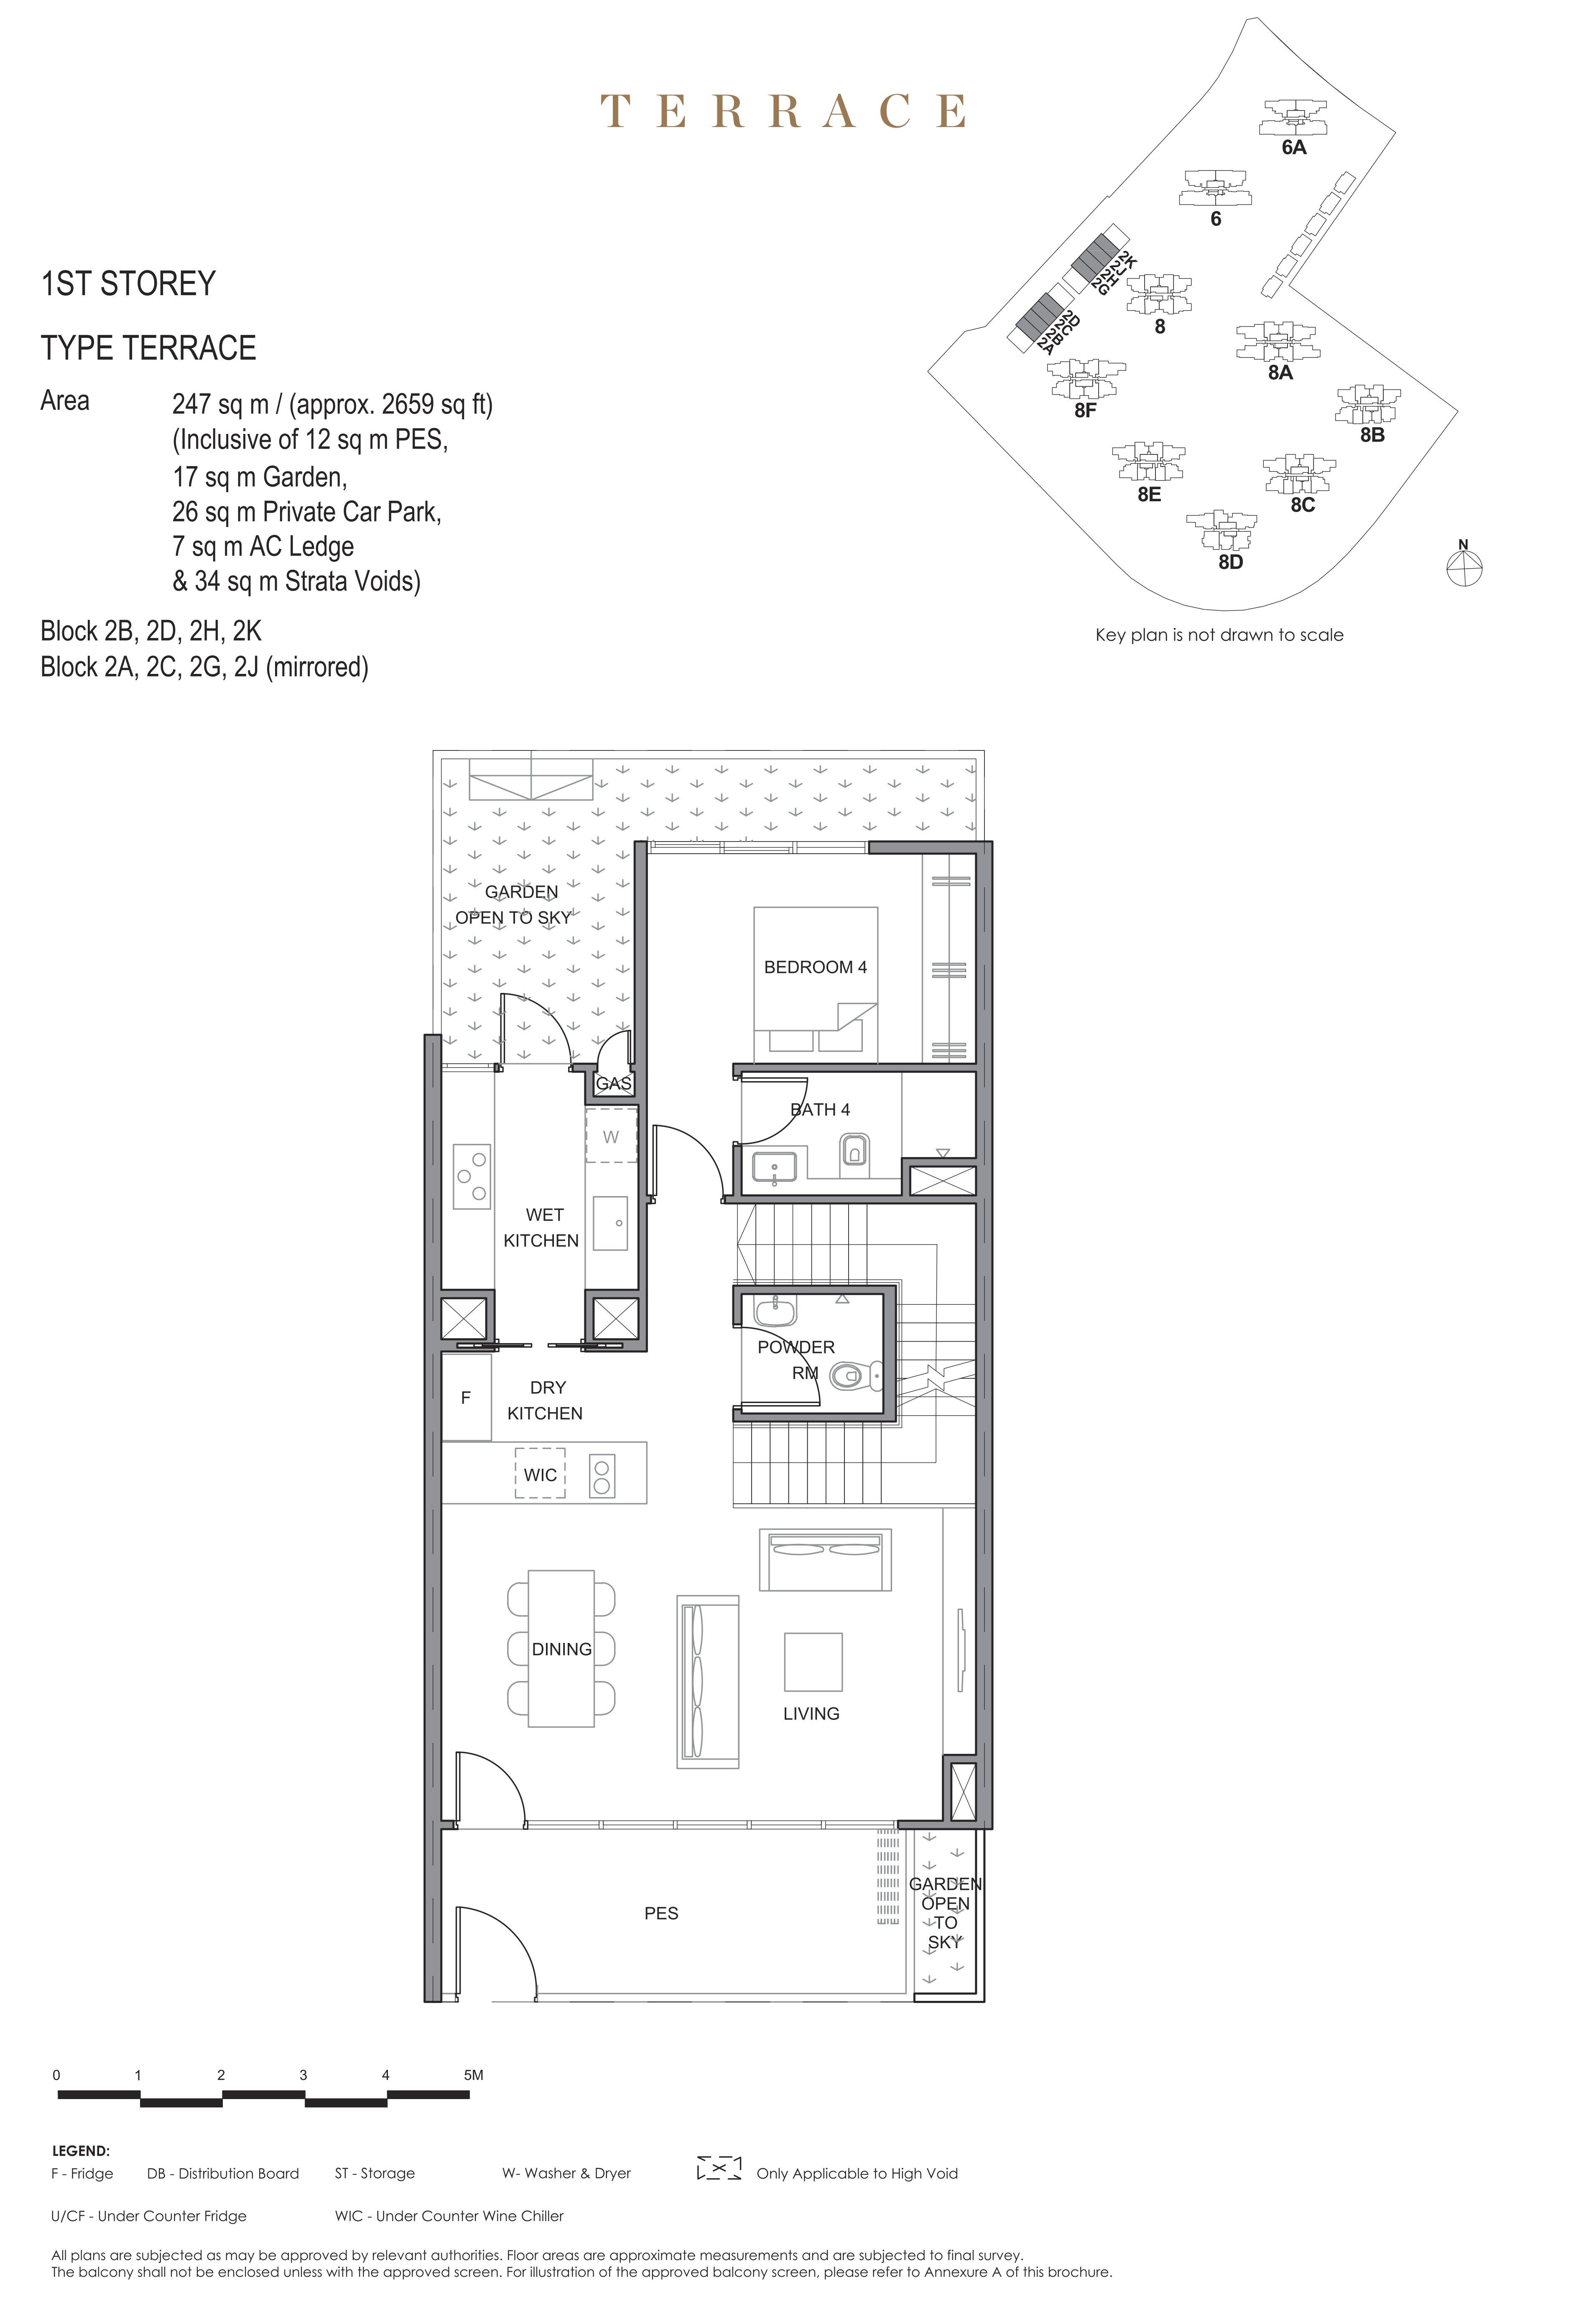 Parc Clematis 锦泰门第 masterpiece Intermediate Terrace 1st storey